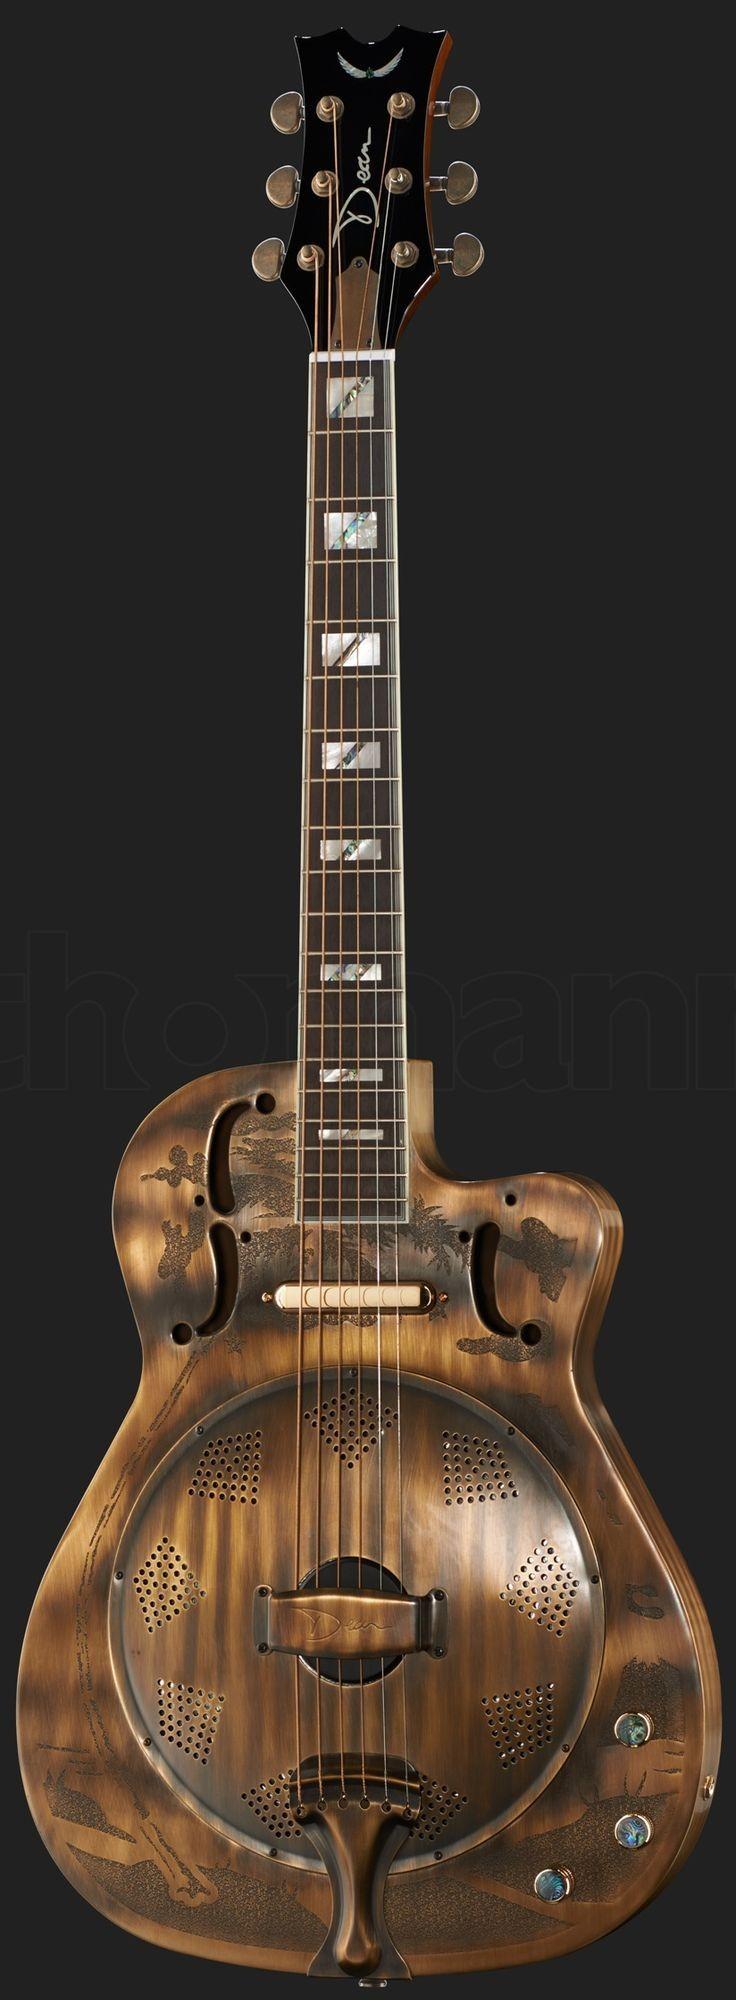 "Dean ""antique bronzed finish"" Resonator Guitar it s retro and we dig it"